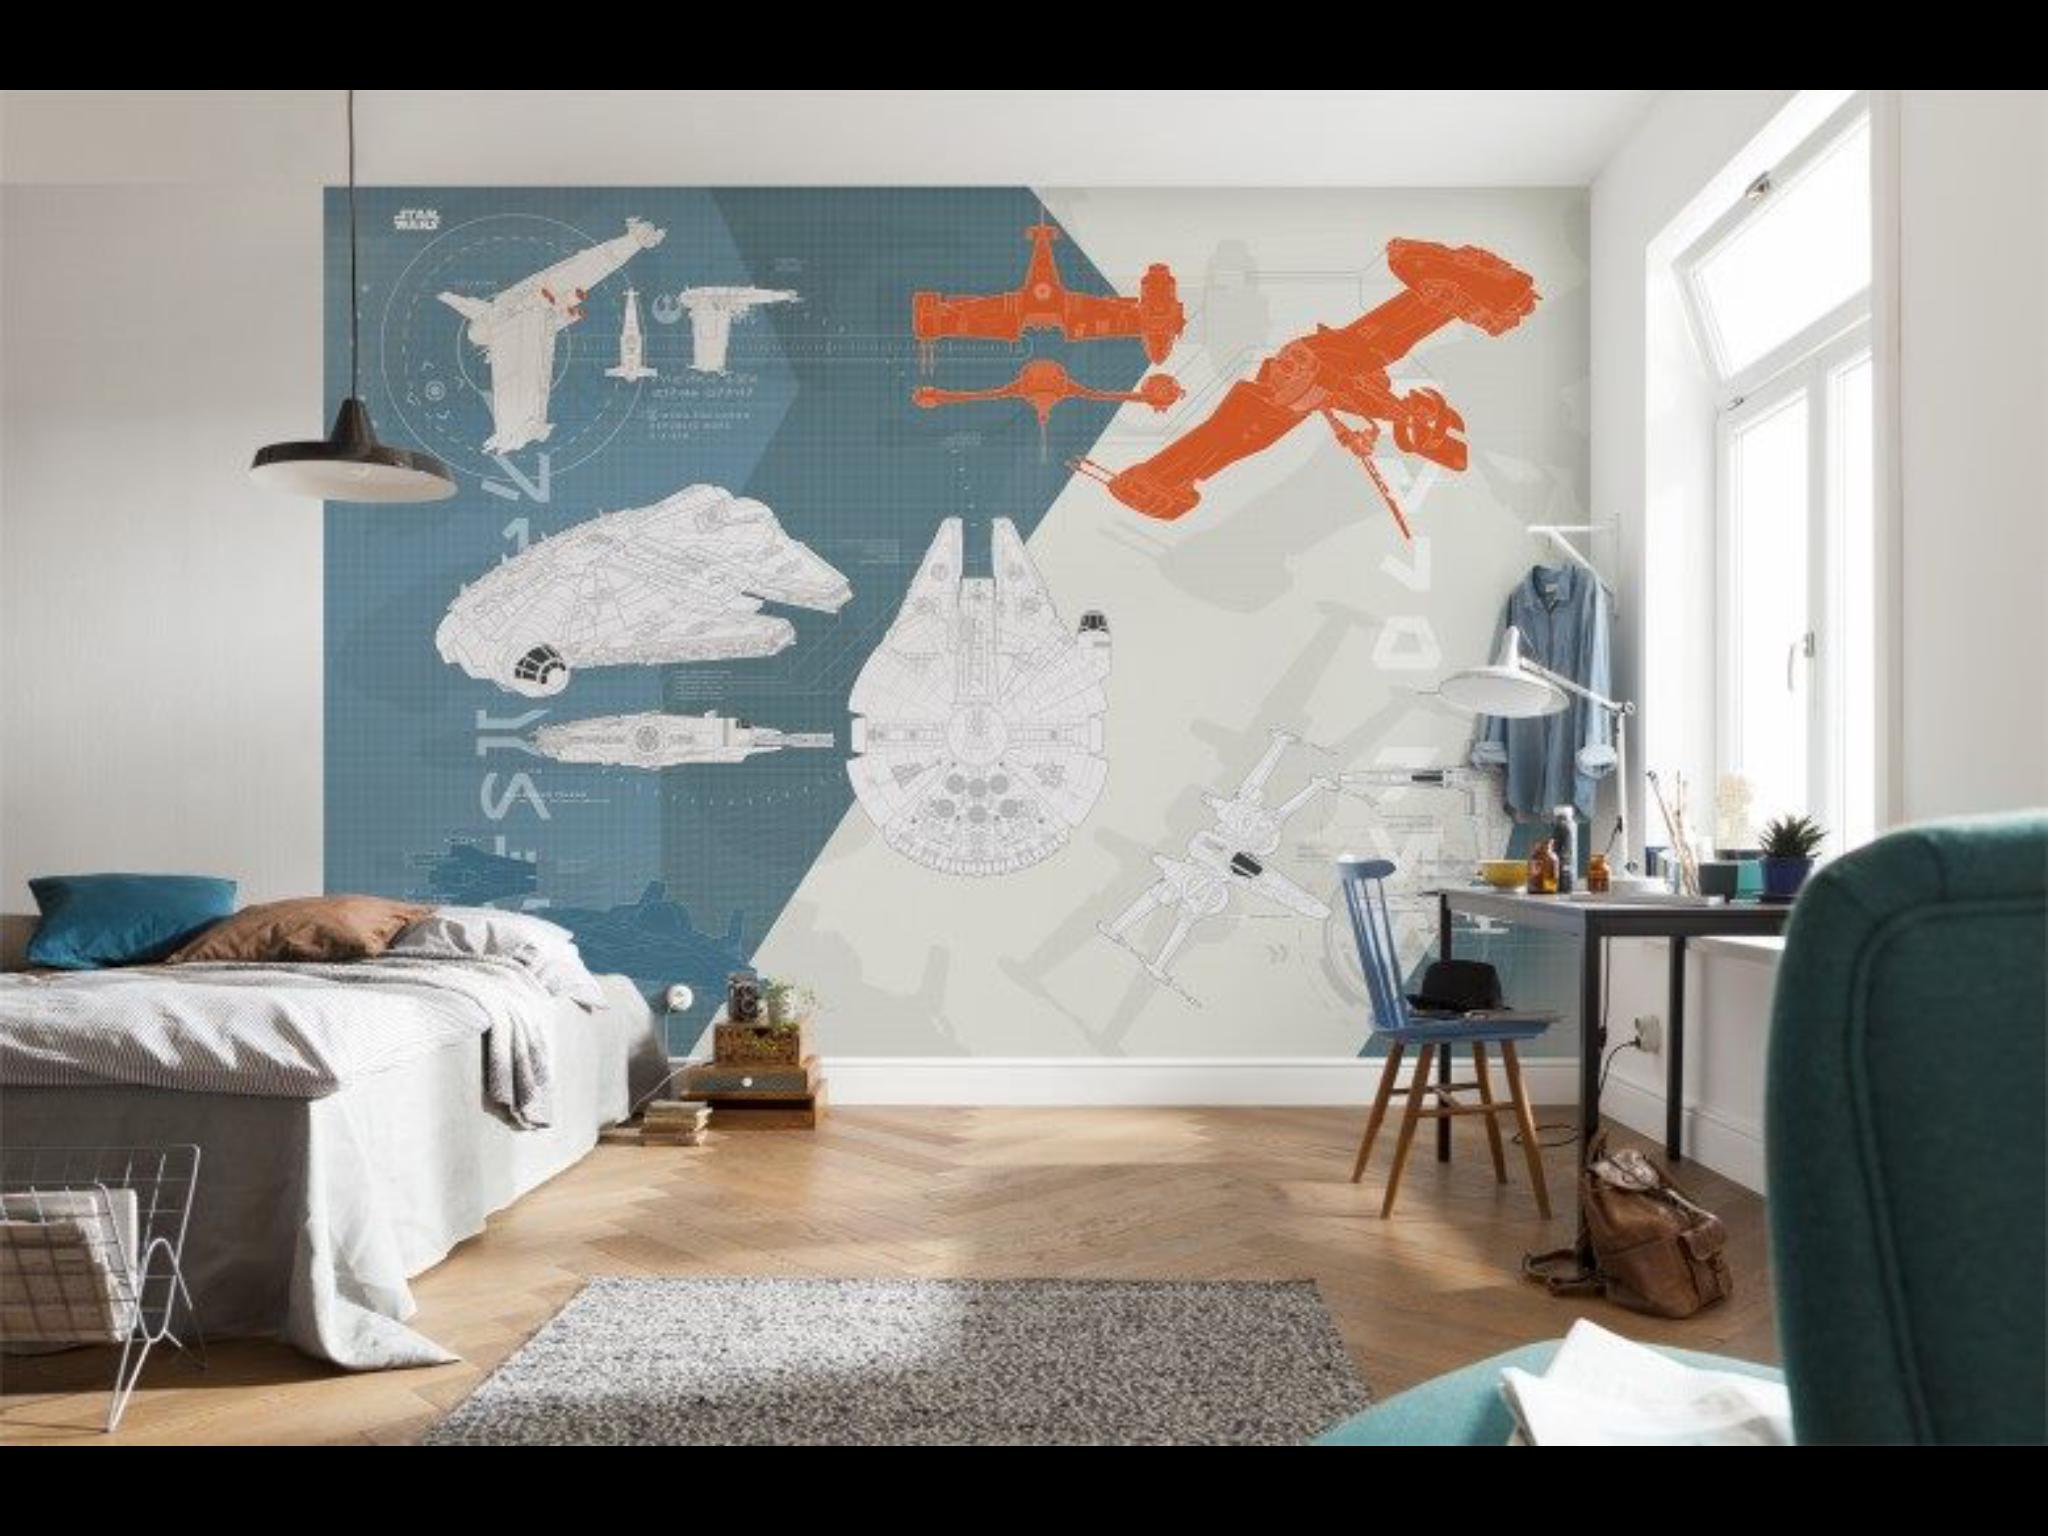 Prekrasnye Novye Star Wars Fotooboi Ot Komar Products Iz Germanii Wonderful New Star Wa Star Wars Kids Room Star Wars Wall Mural Star Wars Wall Decal